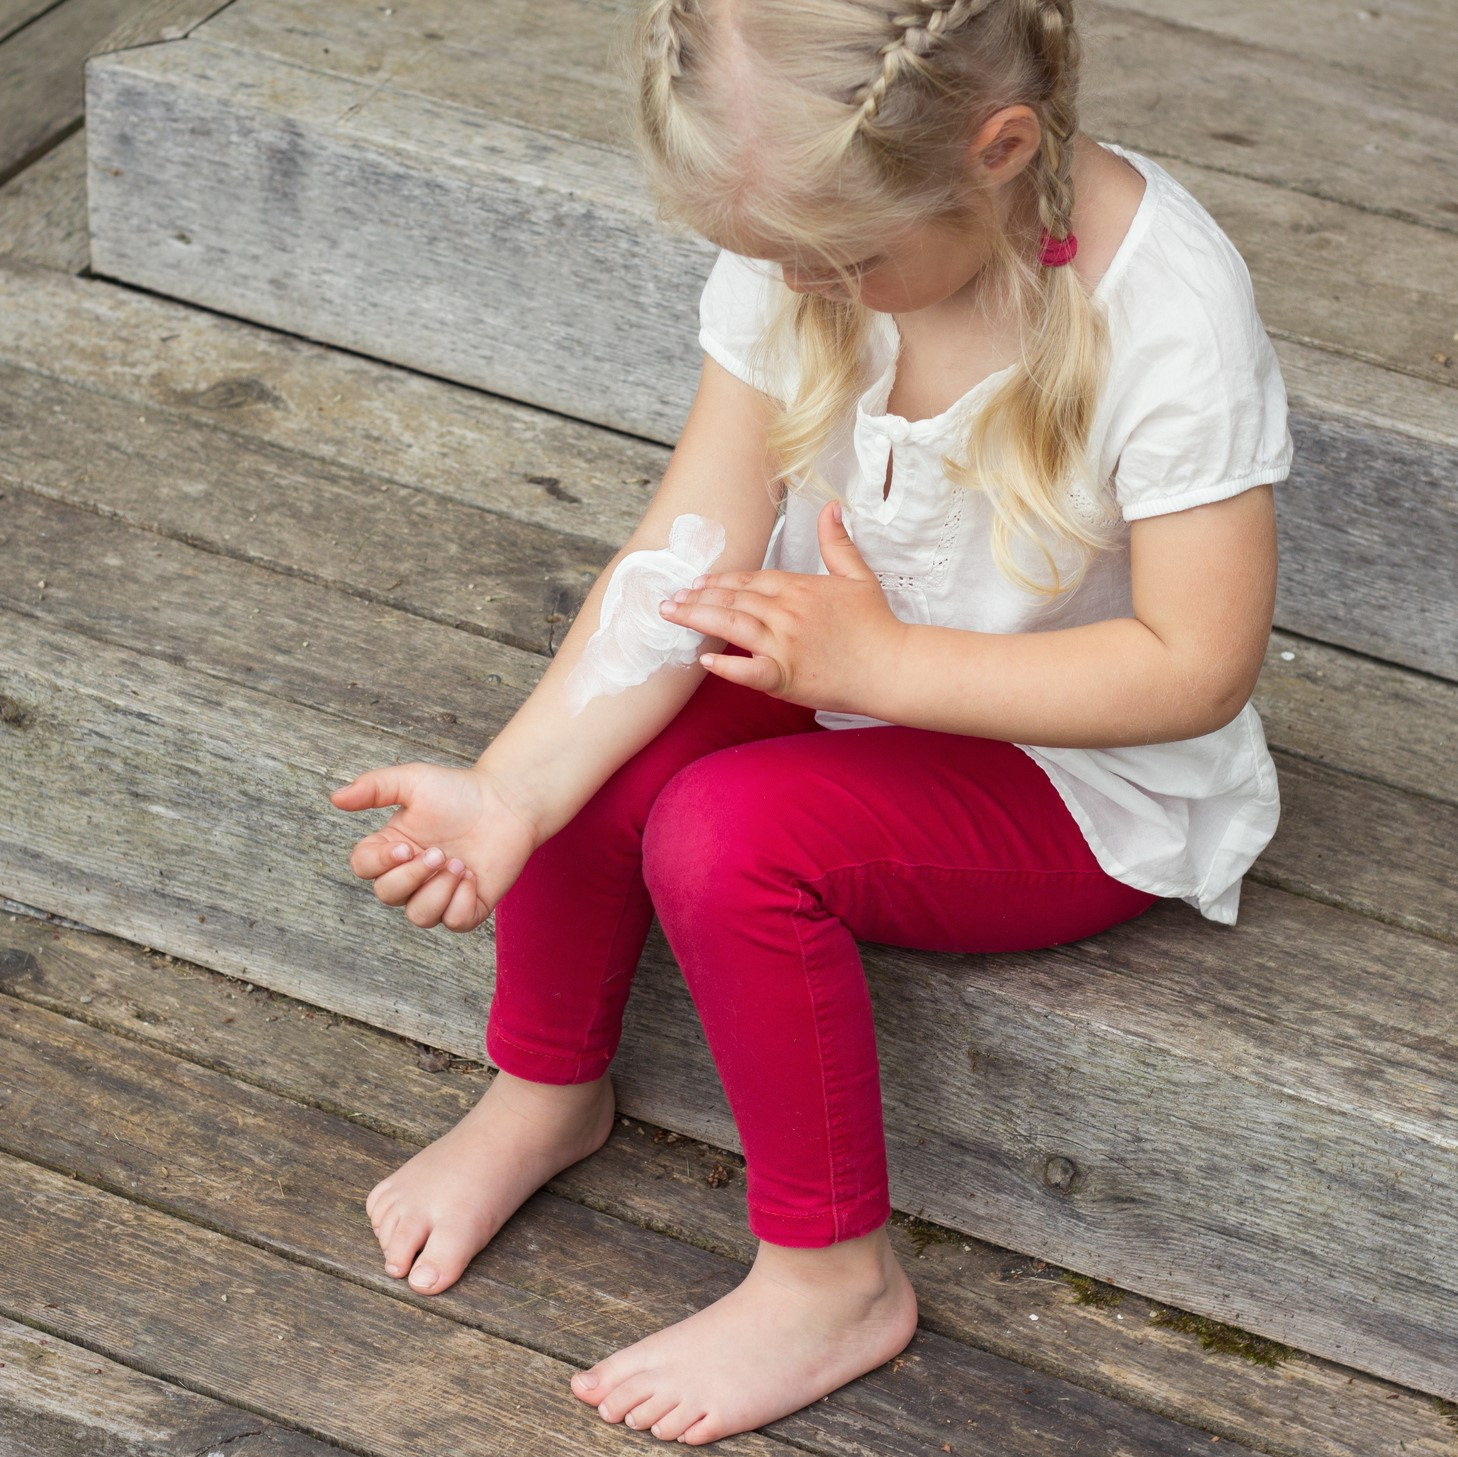 Girl applying cream on skin, eczema treatment.